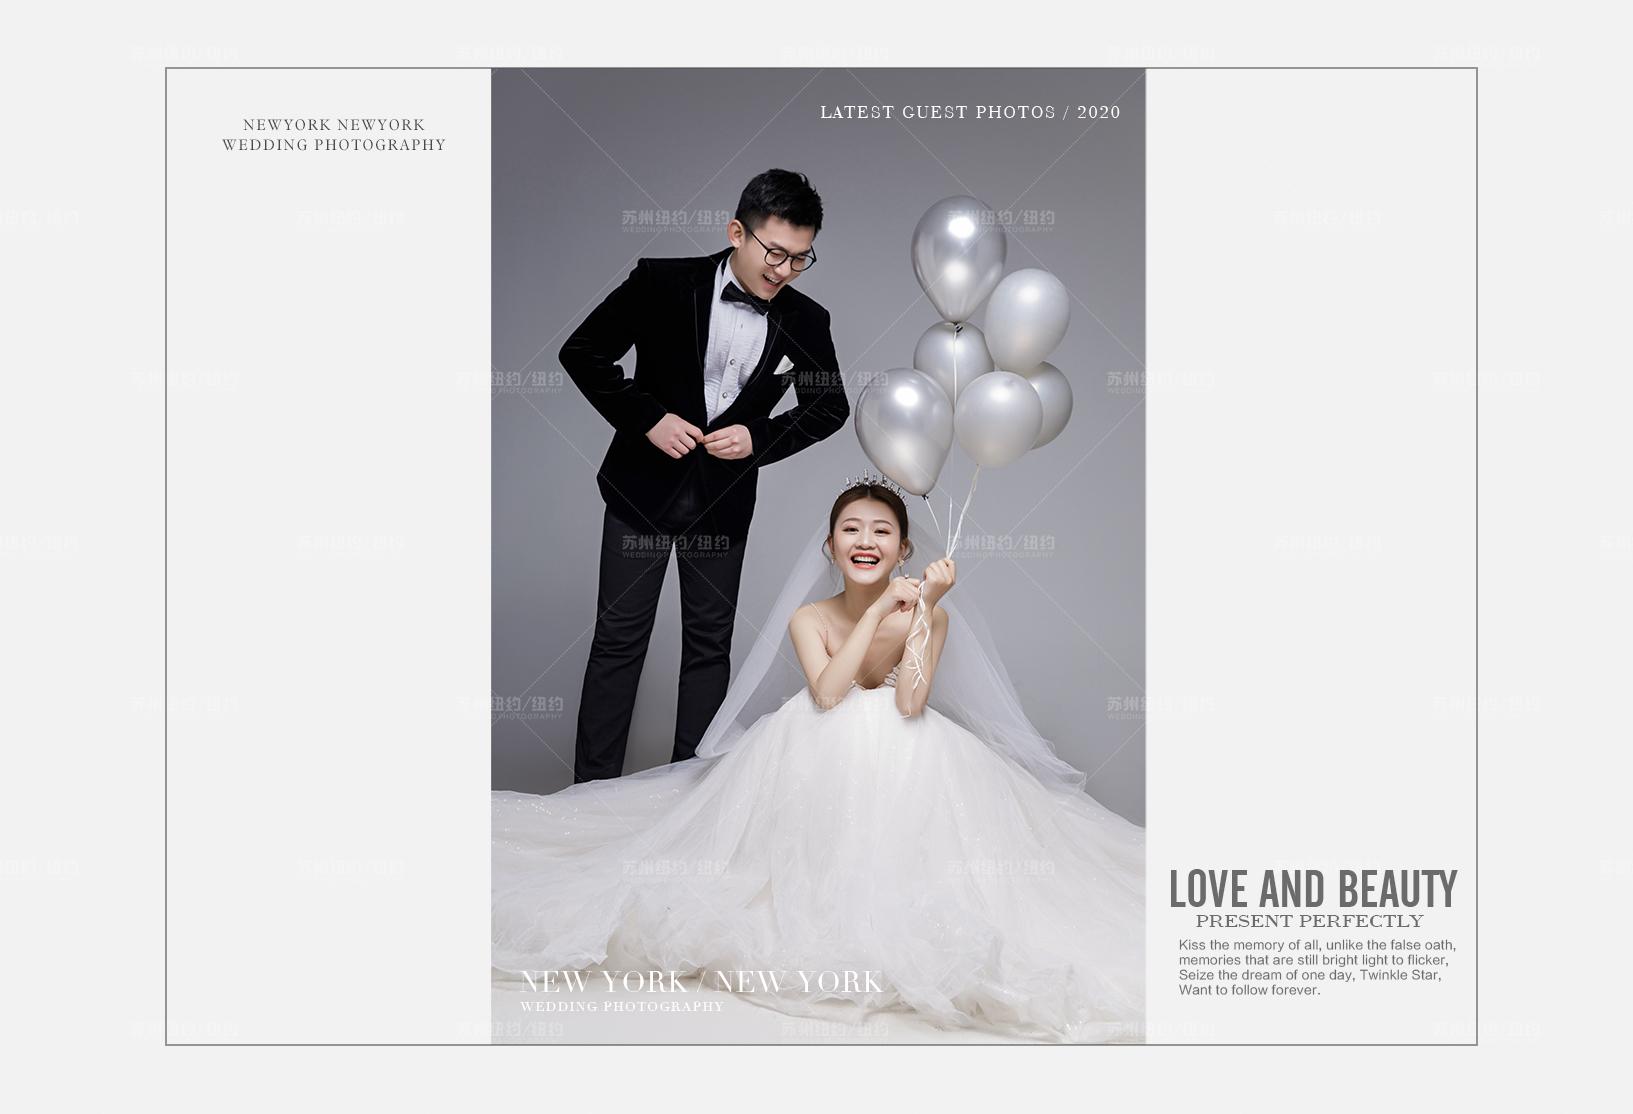 Mr.金 & Ms.桂(纽约纽约最新客照)婚纱摄影照